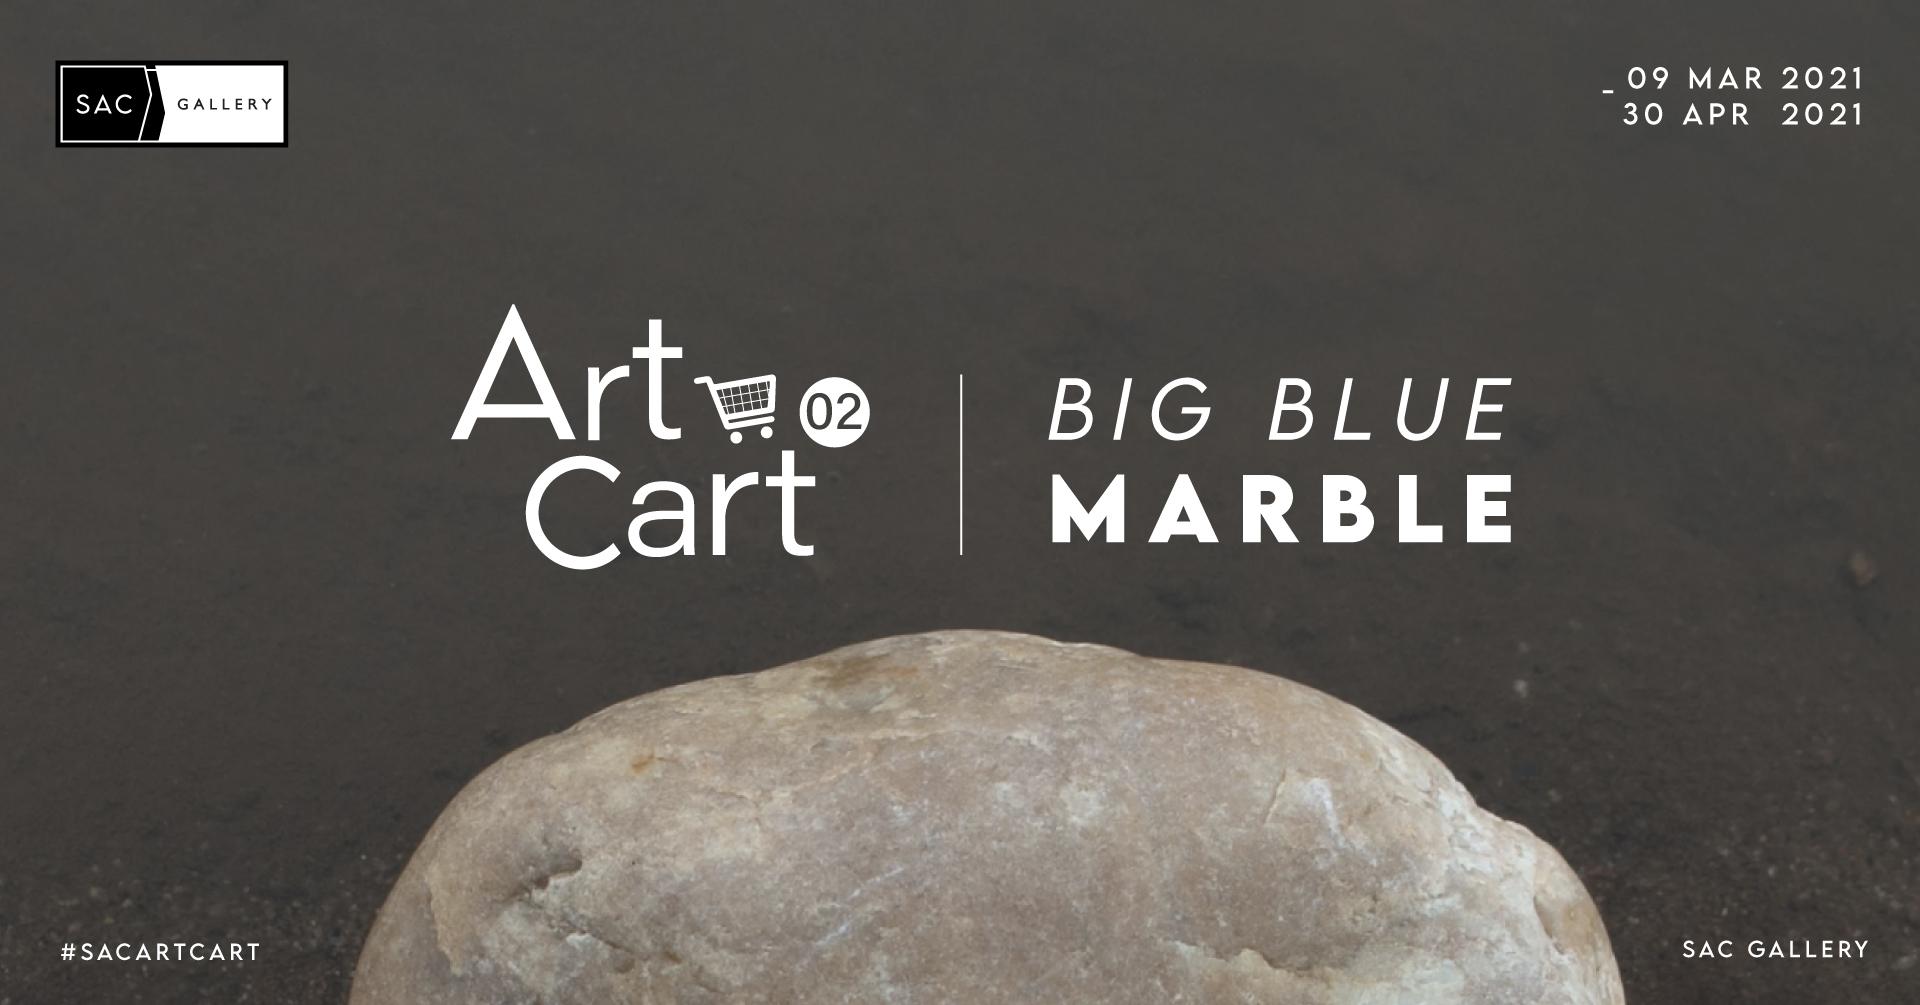 Art Cart 02: Big Blue Marble